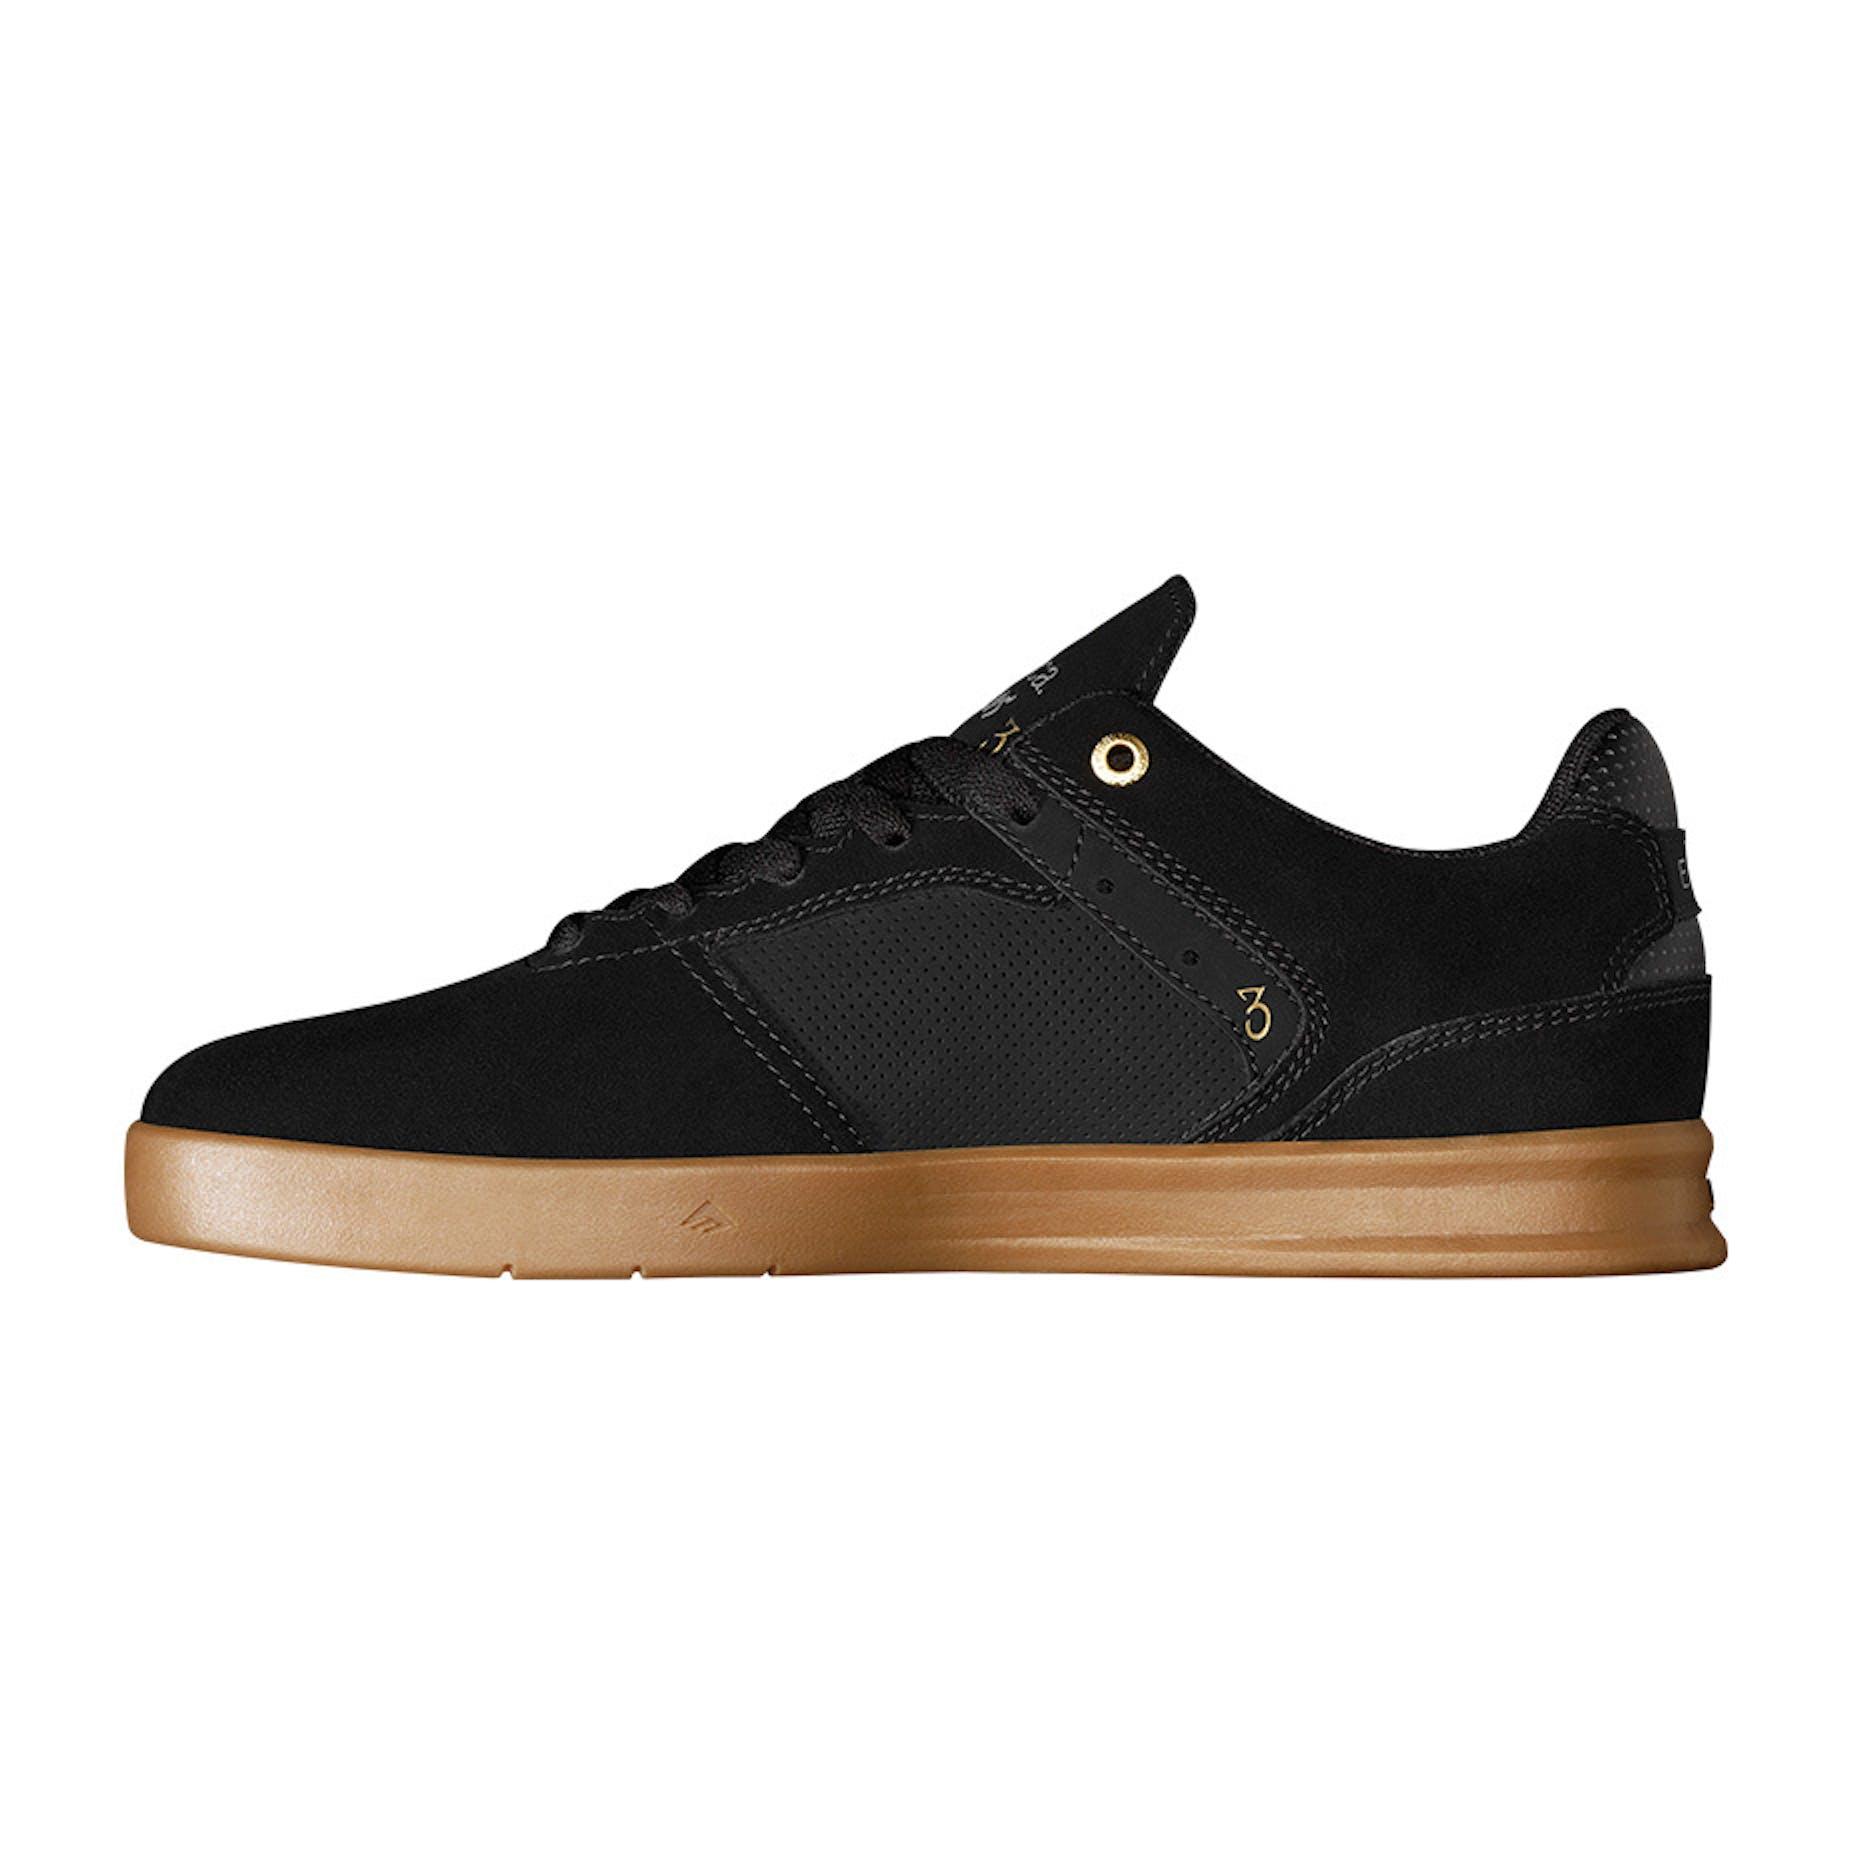 Emerica Reynolds G6 Skate Shoes - Black/Black/Gum